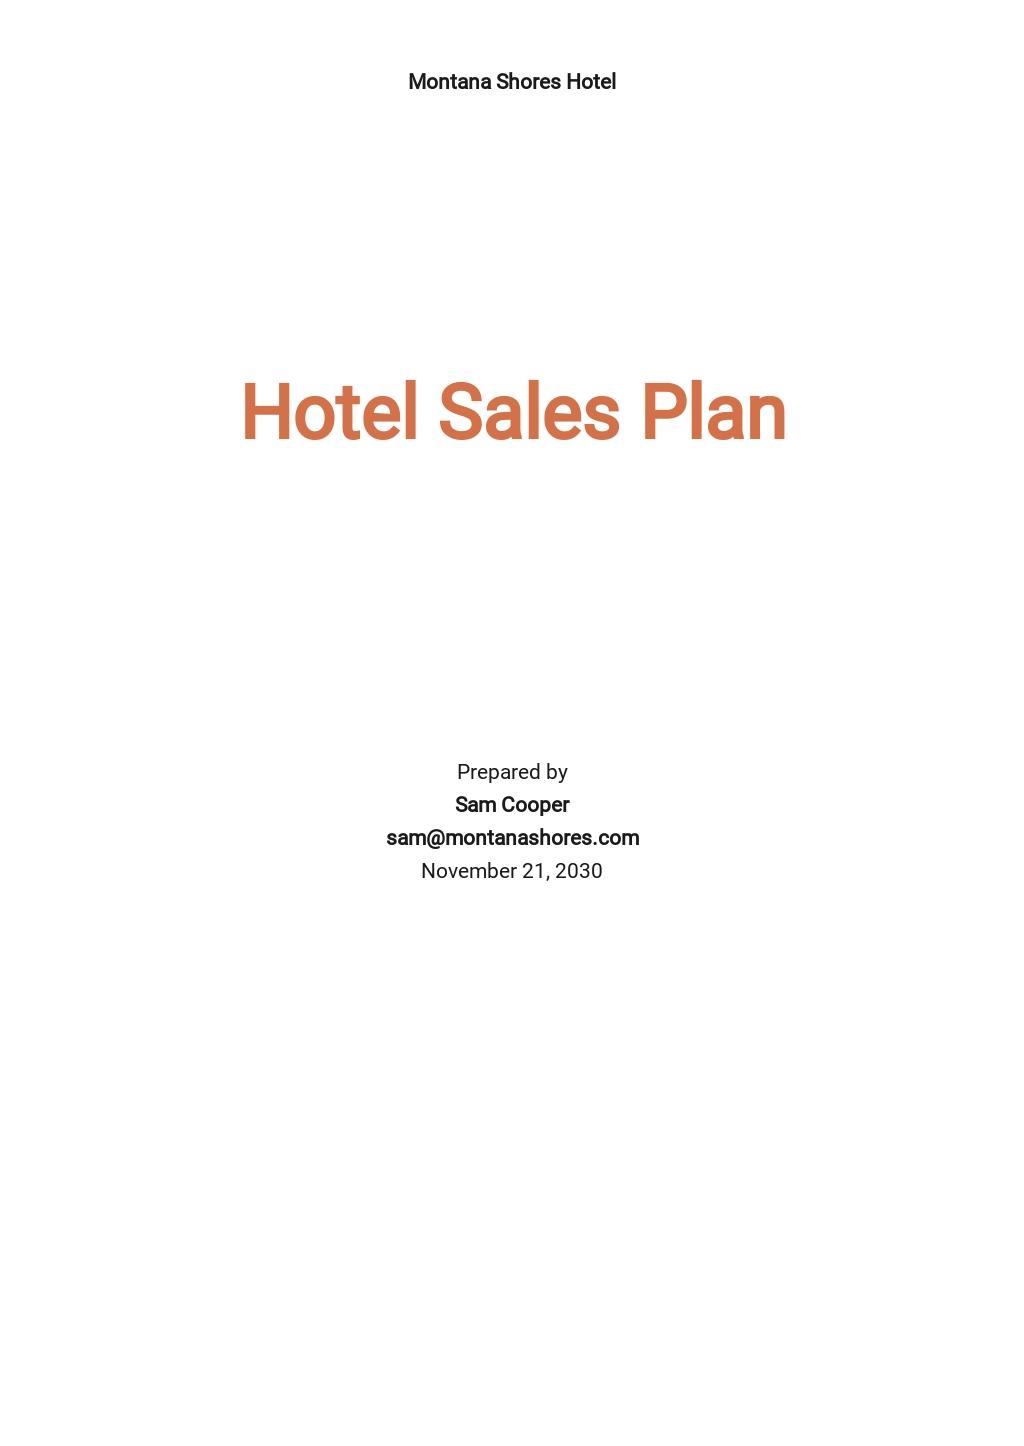 Hotel Sales Plan Template.jpe